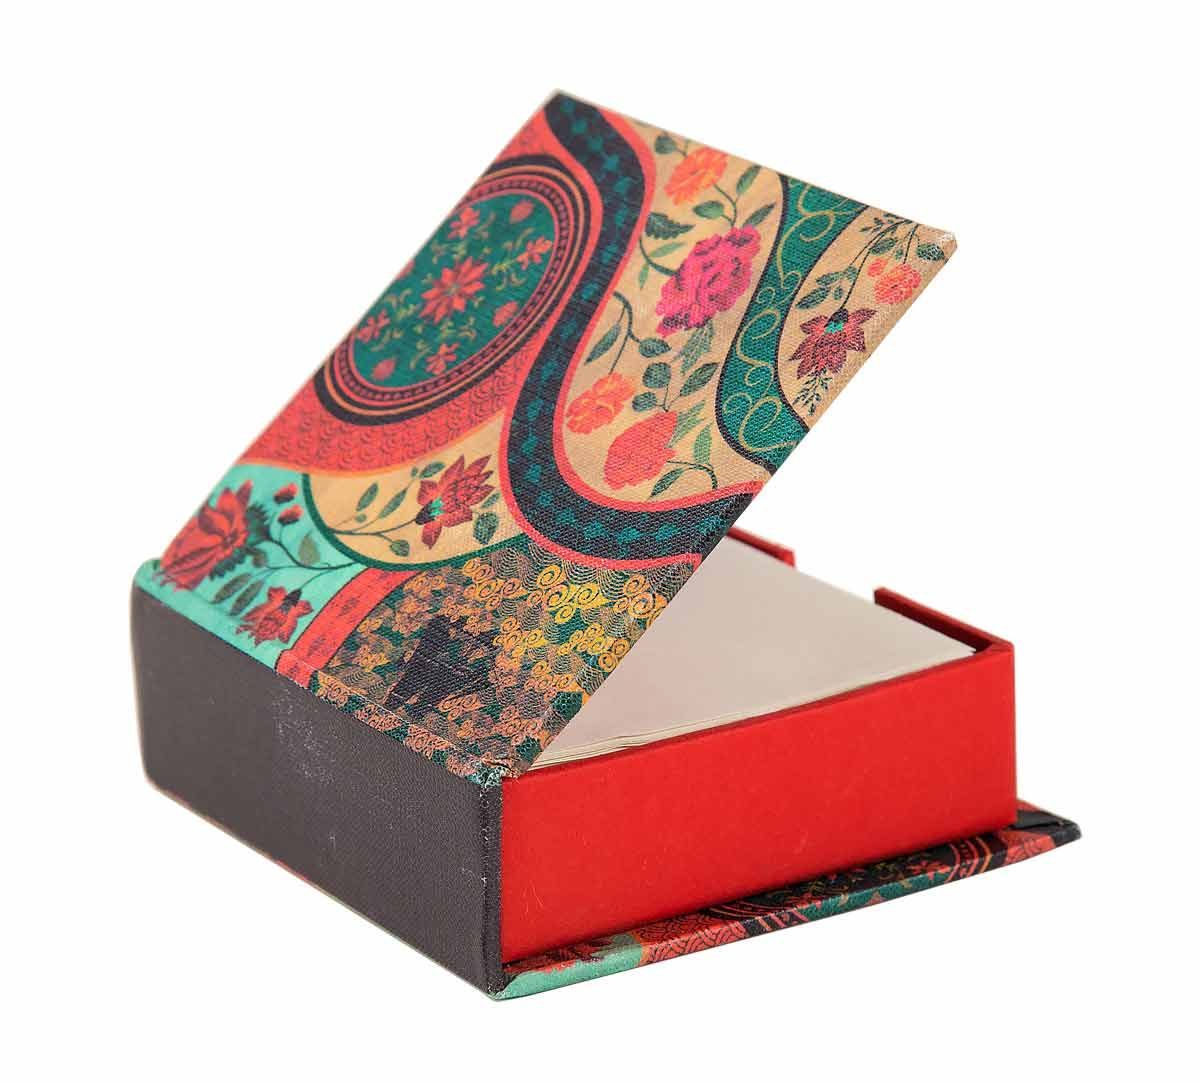 India Circus Floral Embroidery Memo Pad Box